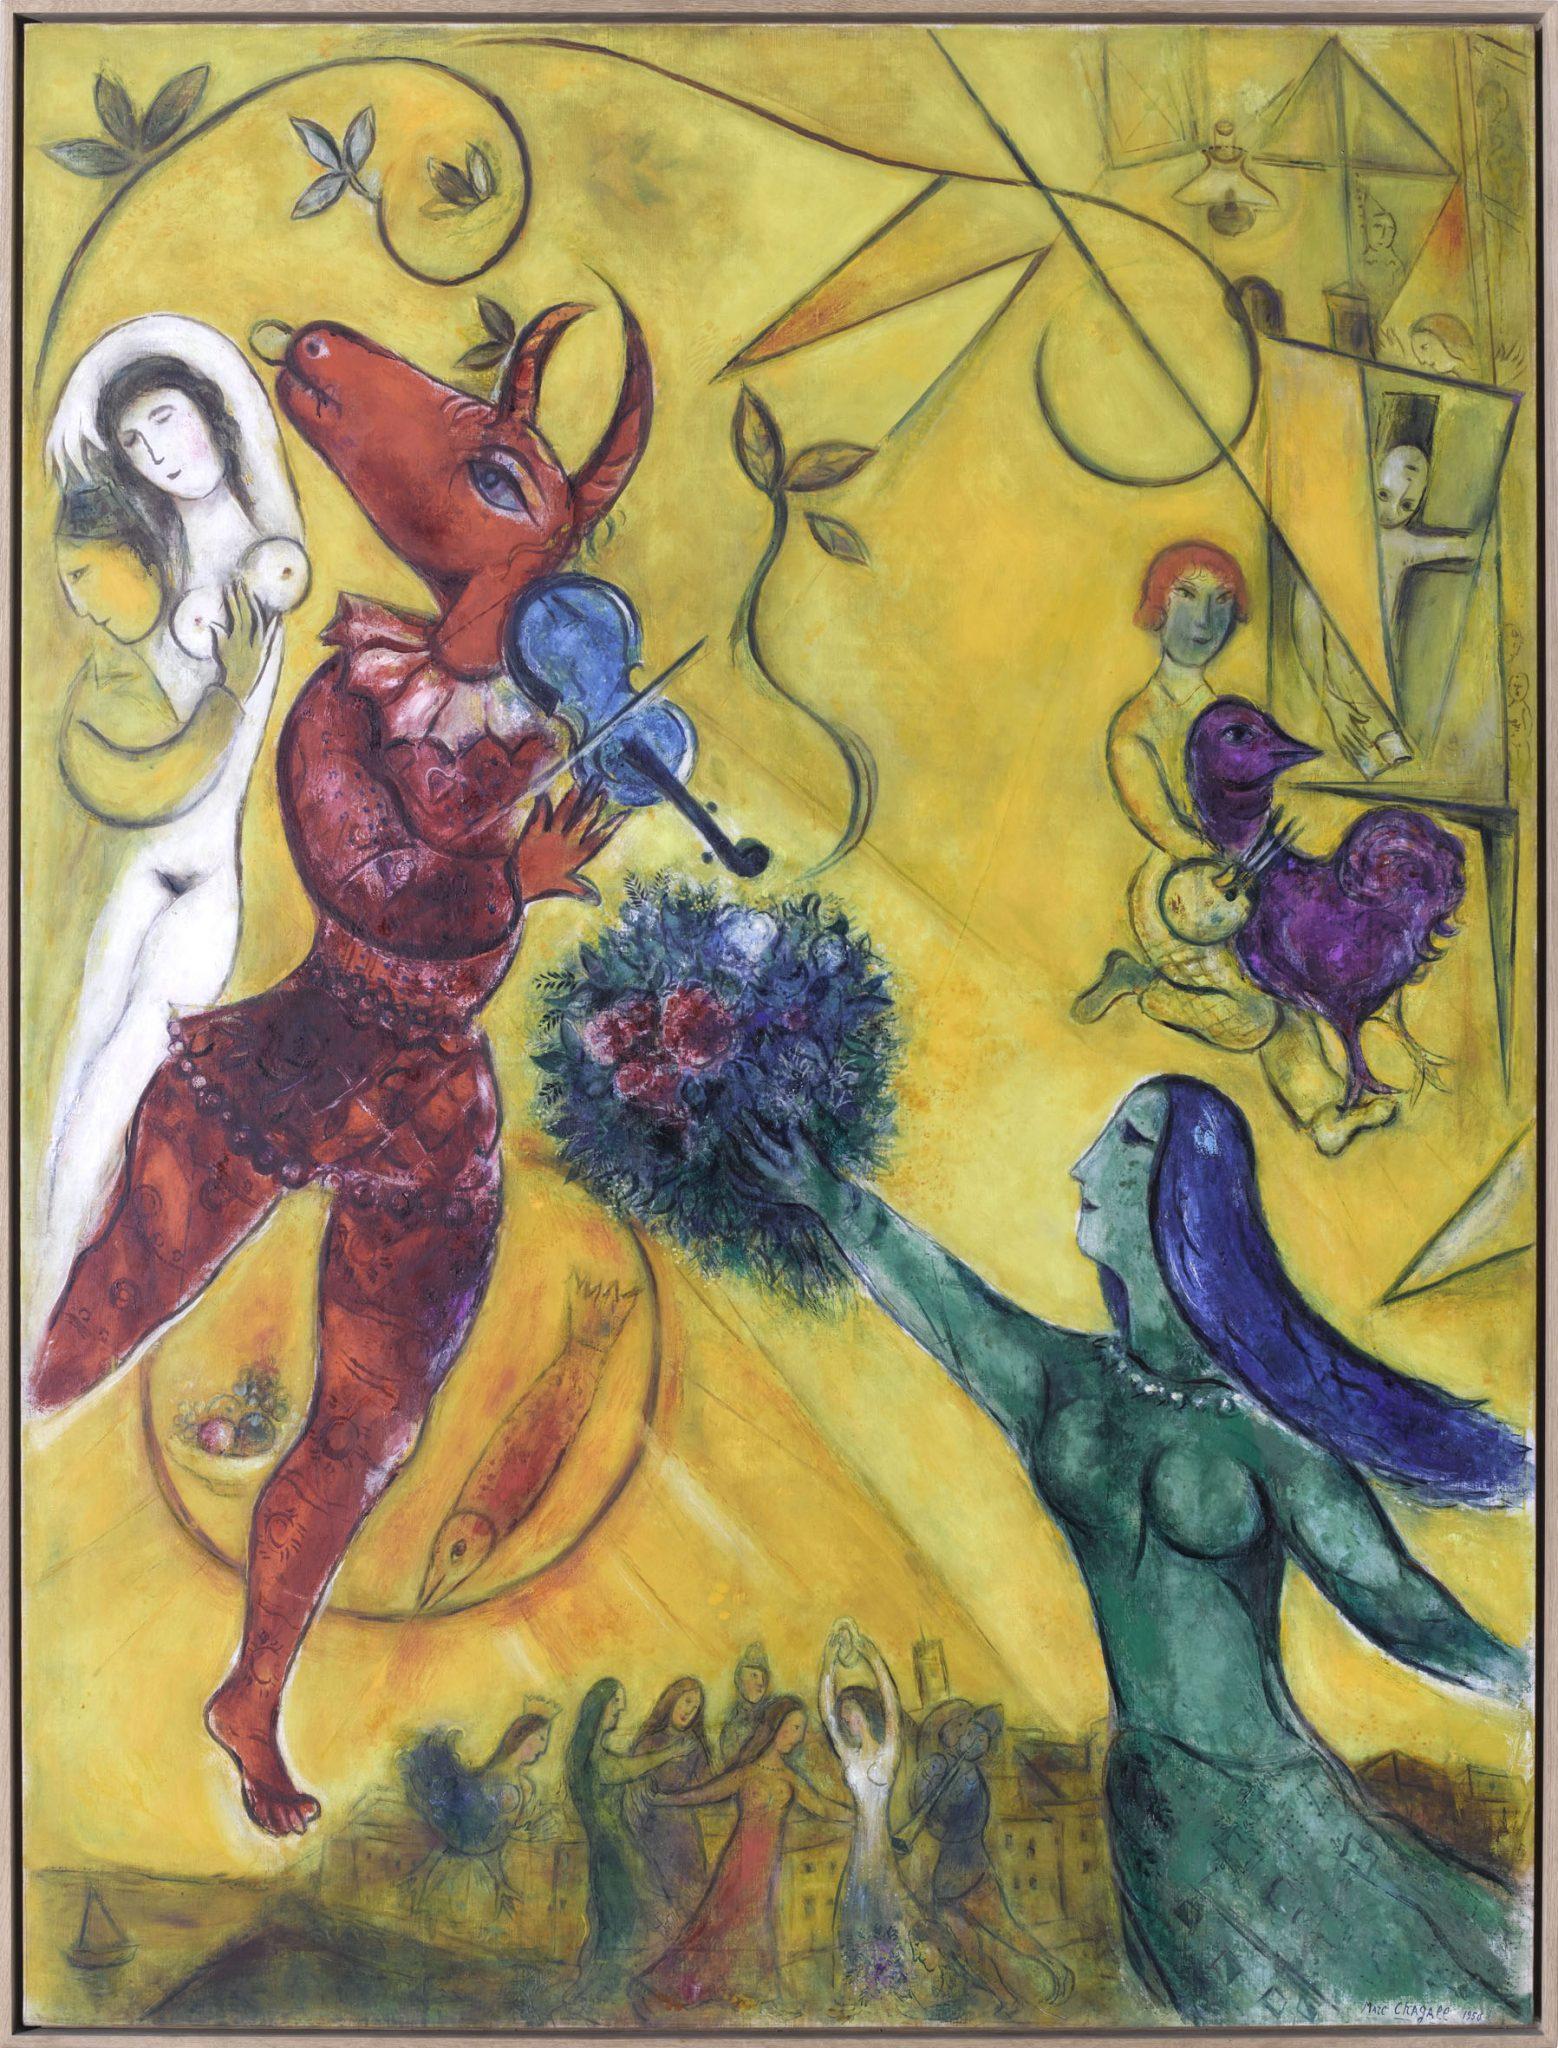 Marc Chagall La danza, 1950 Olio su tela Nice, Musée national Marc Chagall. Photo © RMN-Grand Palais (musée Marc Chagall) / Gérard Blot © Chagall ®, by SIAE 2017